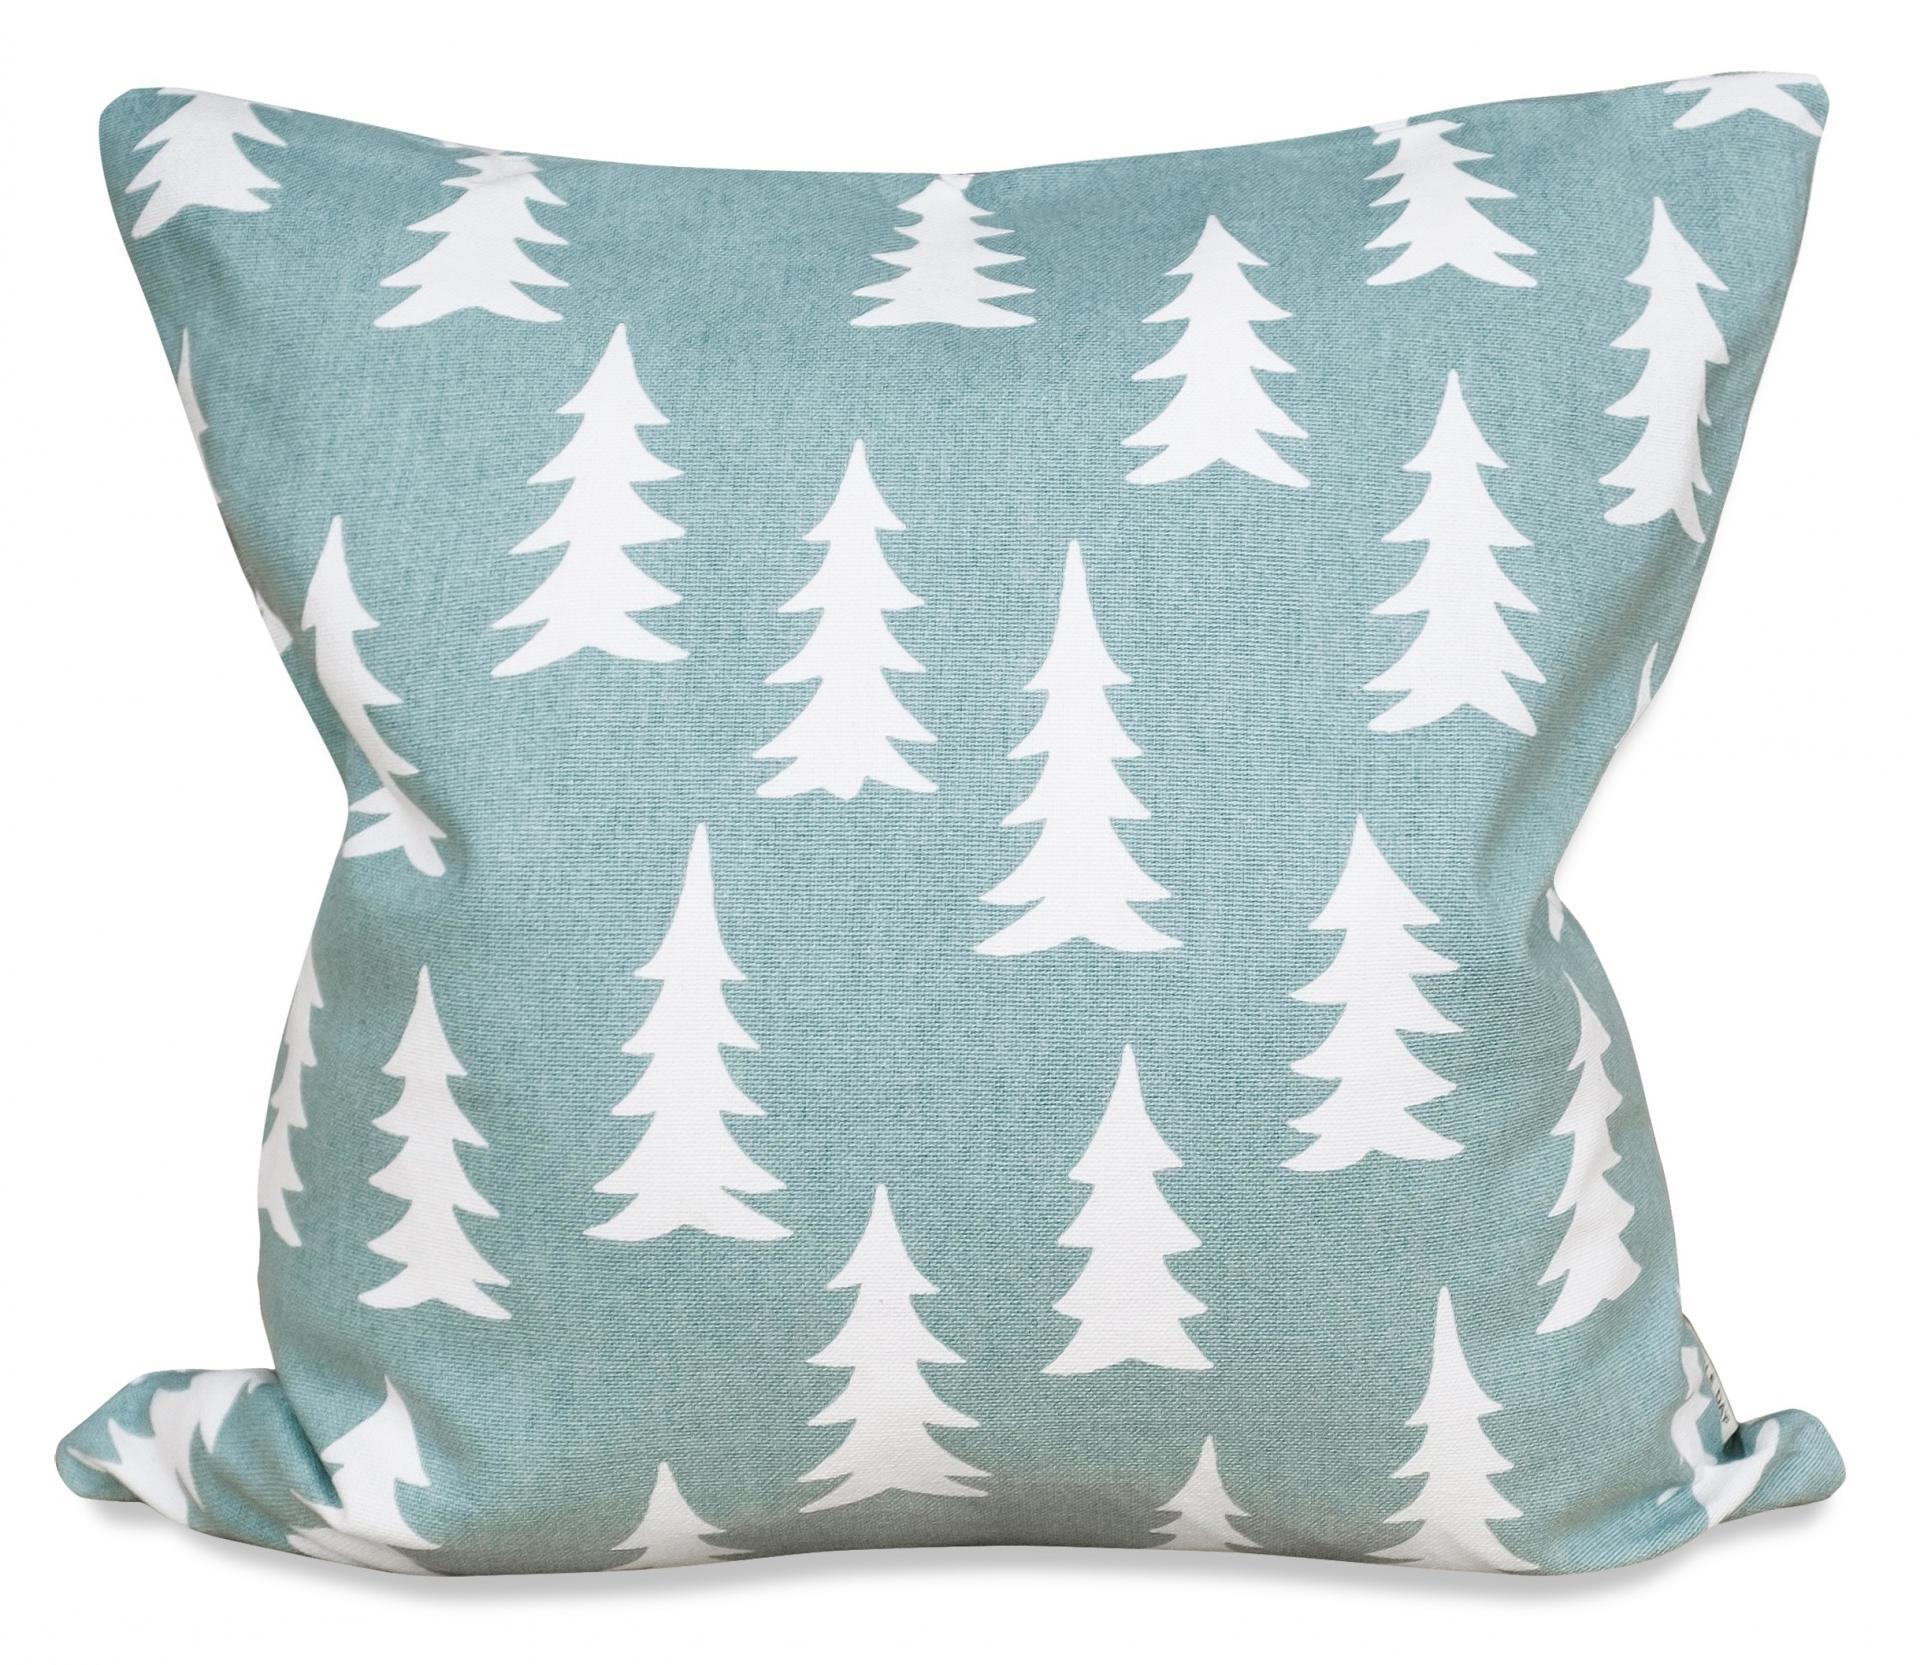 Fine Little Day Povlak na polštář Gran Turquoise 50x50 cm, modrá barva, zelená barva, textil